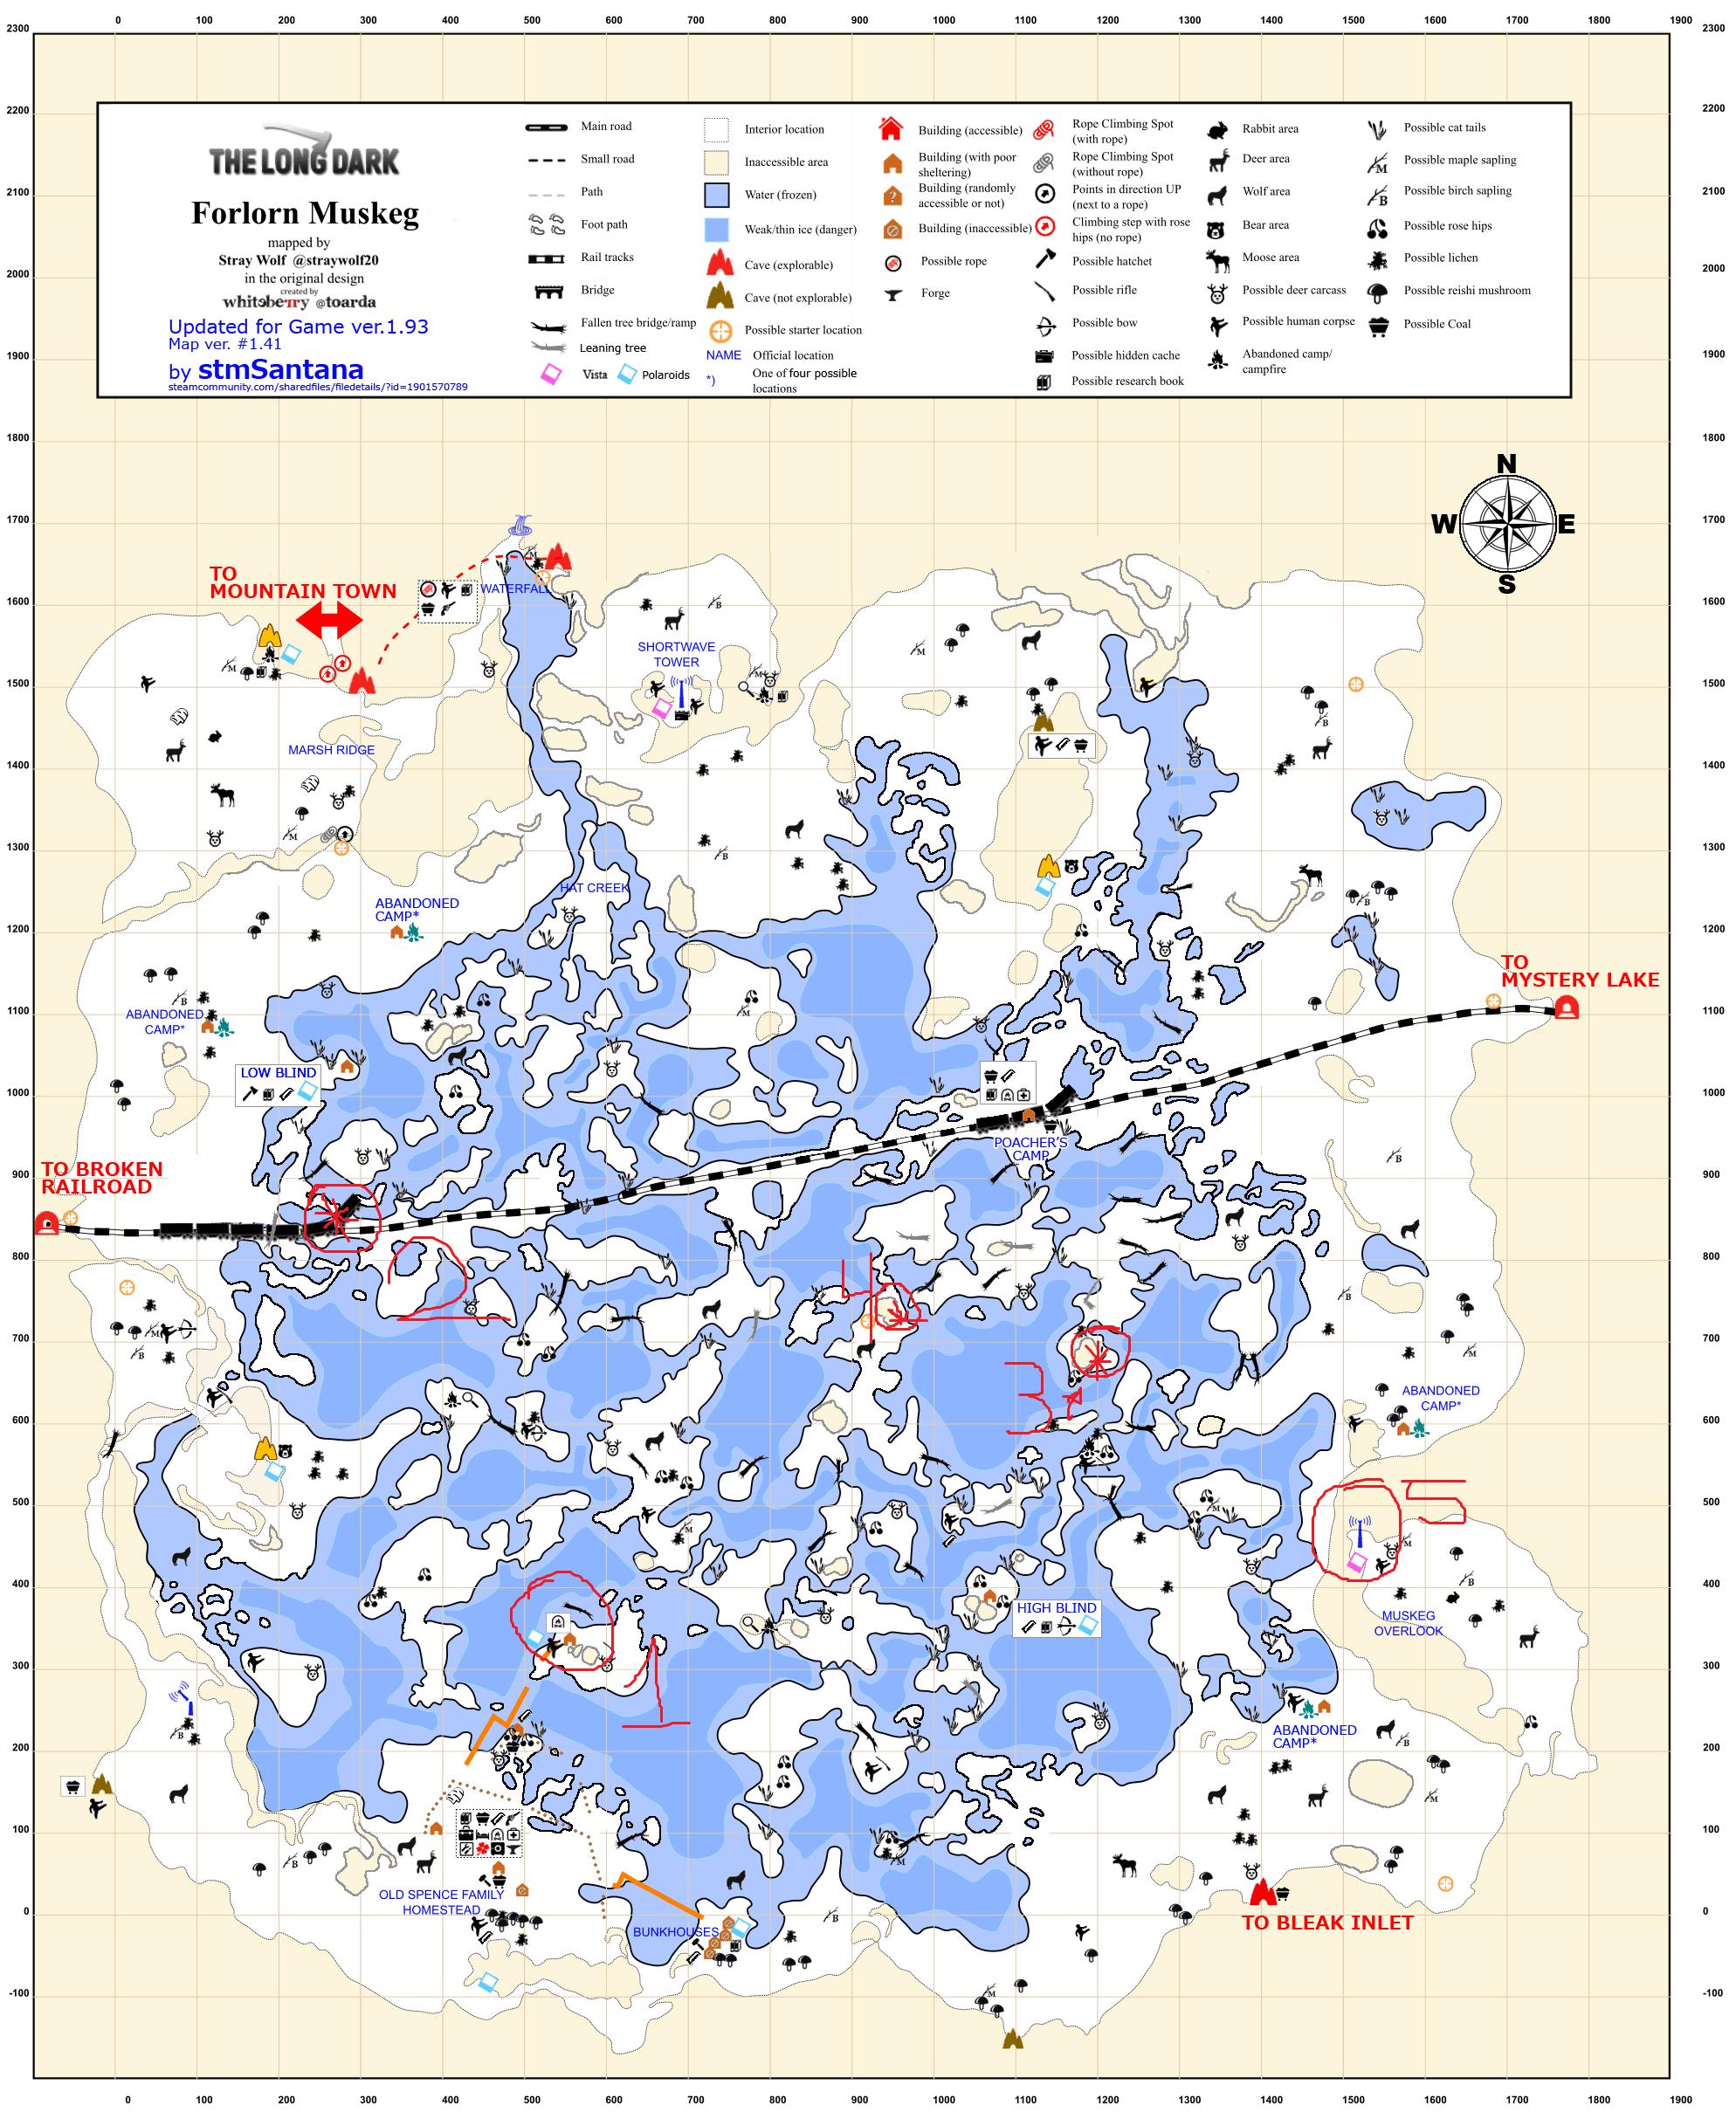 The Long Dark - Advanced rock cache placing + Top 5 caches per region - 8-Forlon Muskeg - DC15CD5